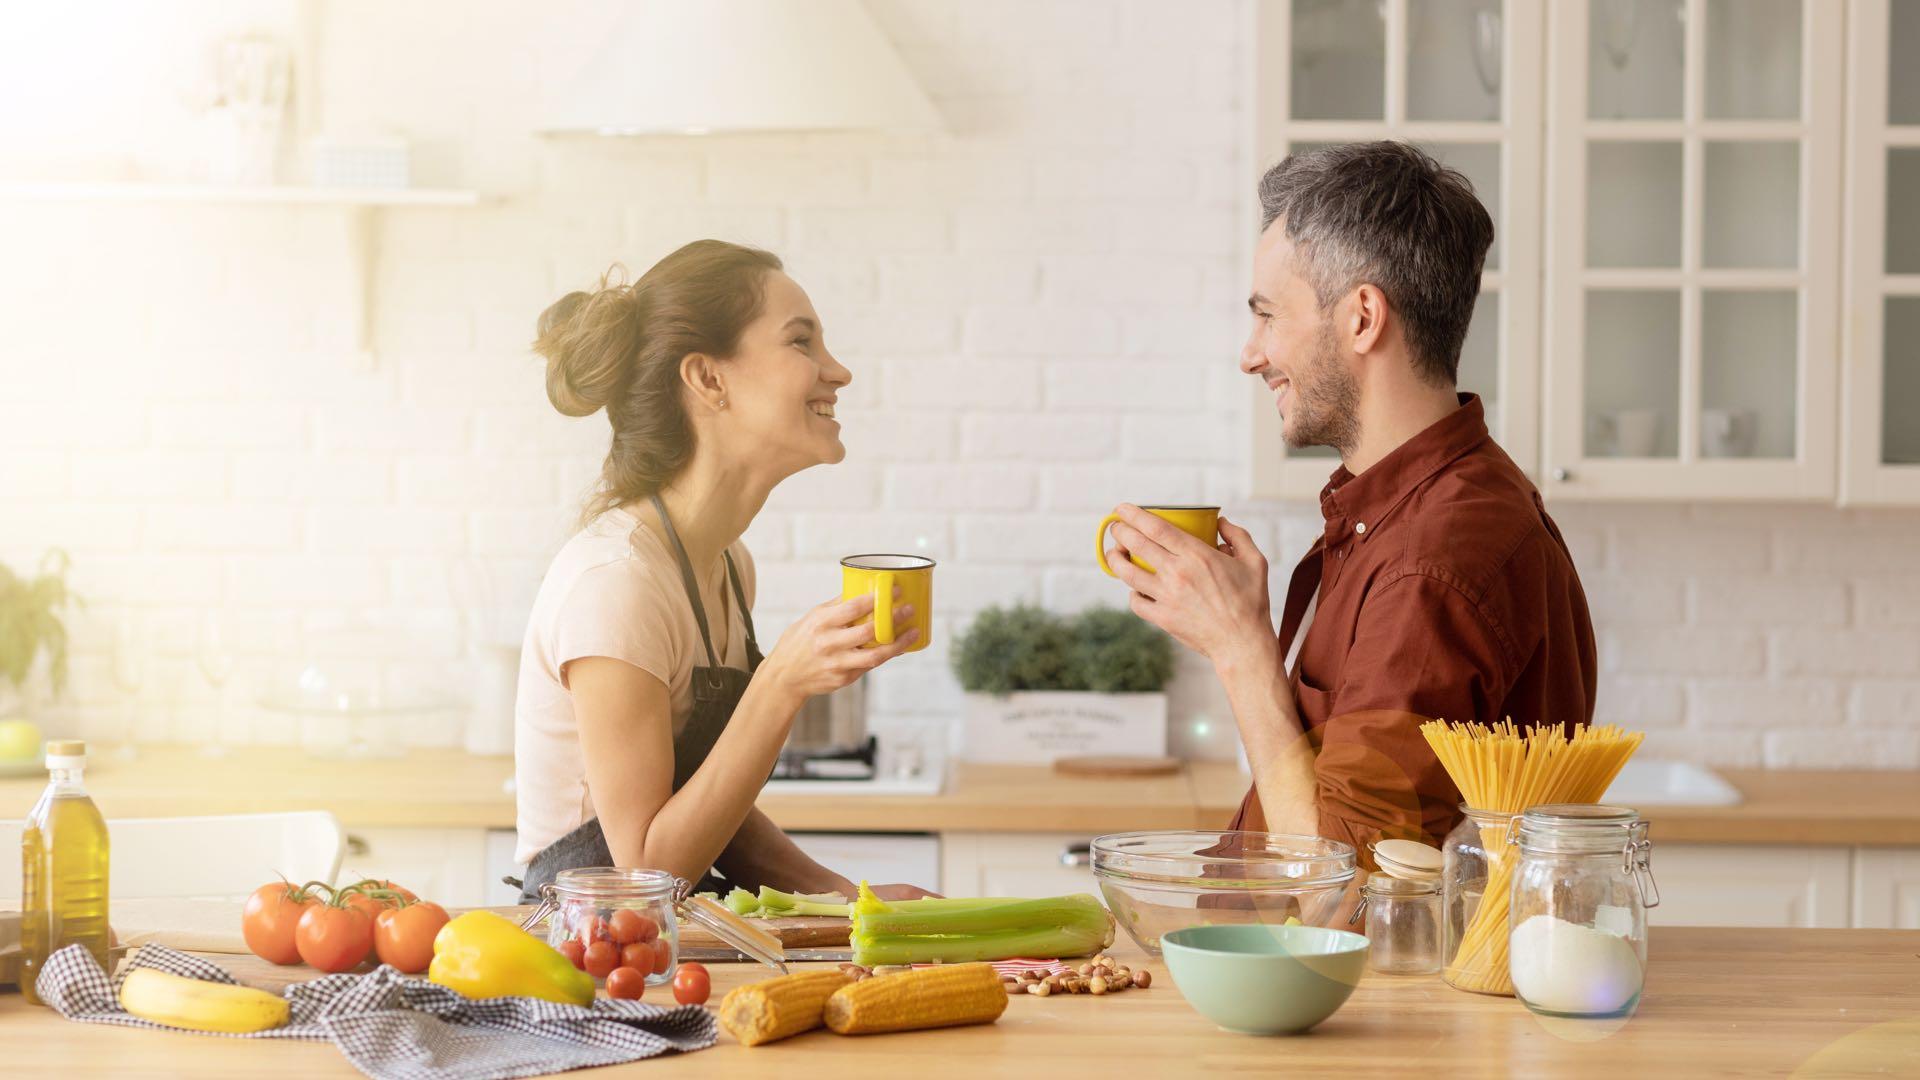 Beziehung gemeinsam kochen